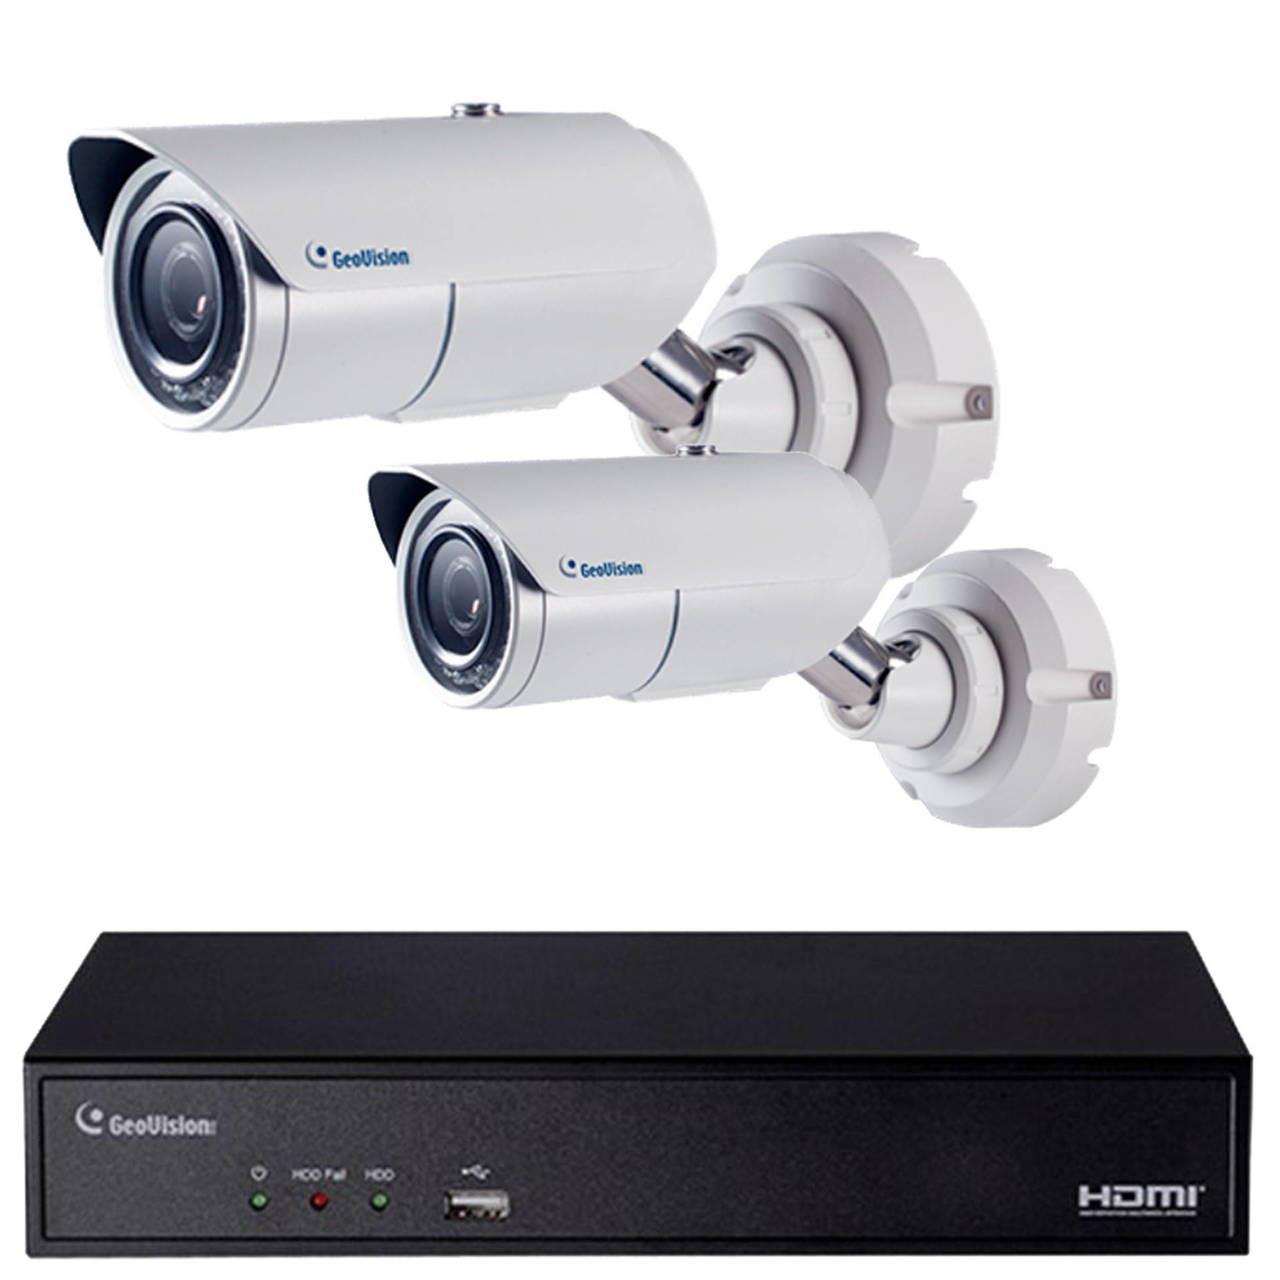 2-Camera 2MP License Plate Capture (LPR) IP Security Camera System - 1080p  Full HD, Max  Speed 37mph, Night Vision, SL2C37IP1T